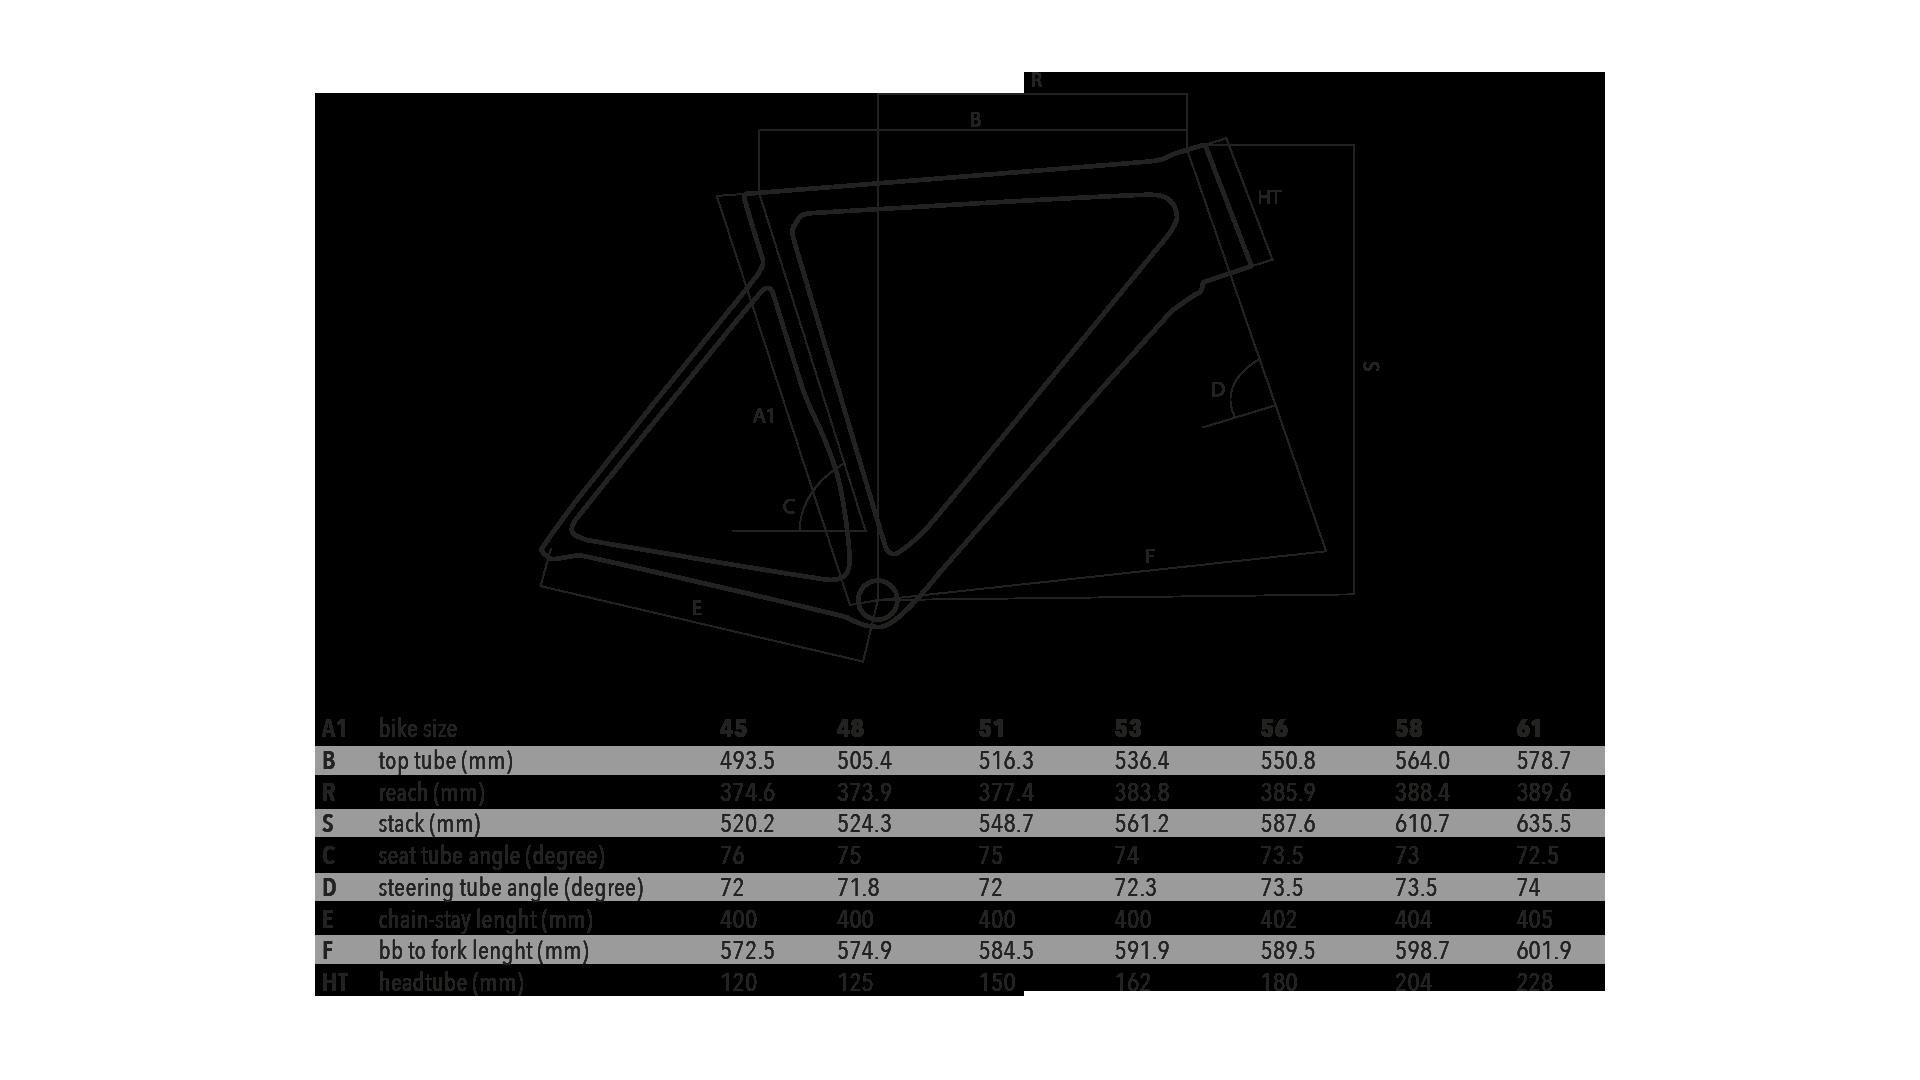 Geometria roweru Basso Venta